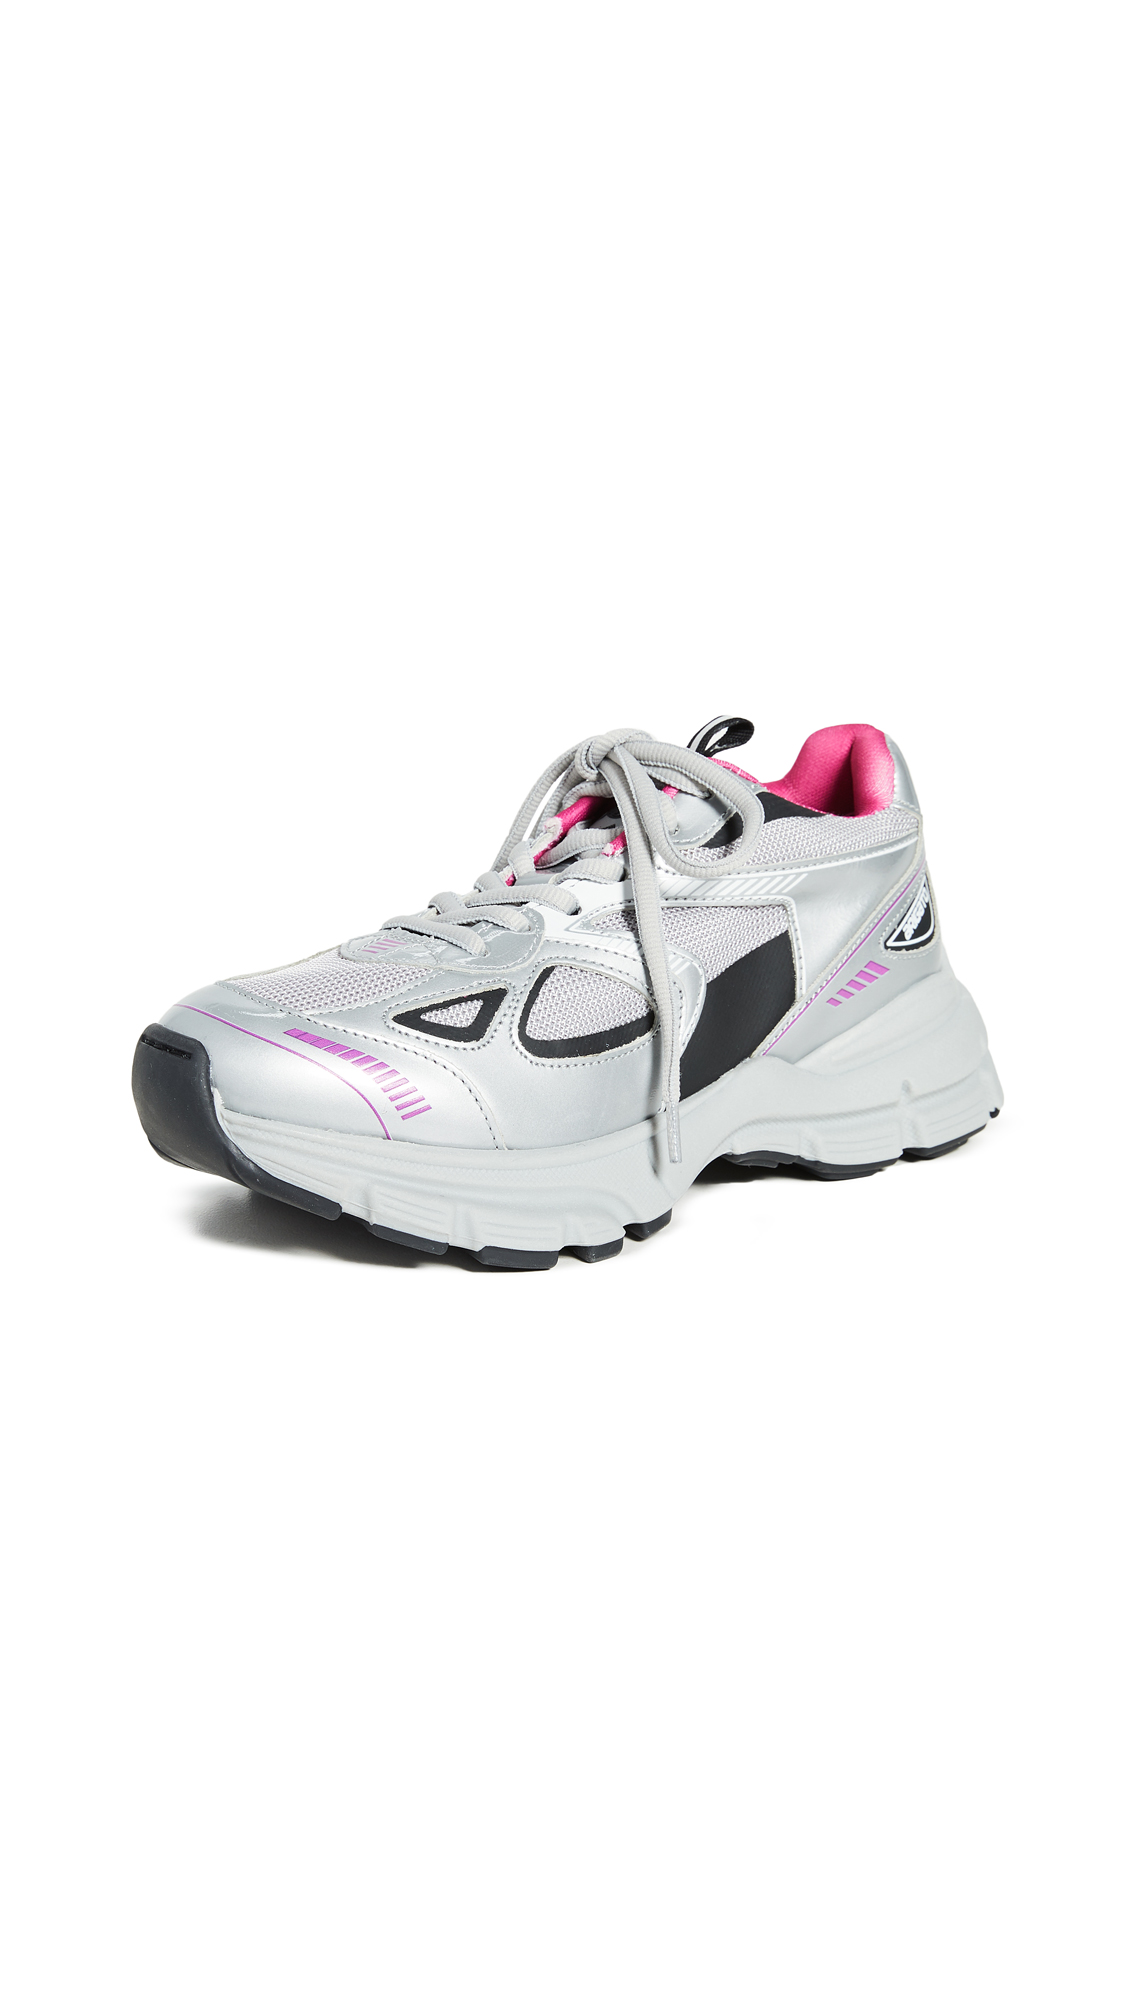 Axel Arigato Marathon Sneakers - Grey/Pink/Black